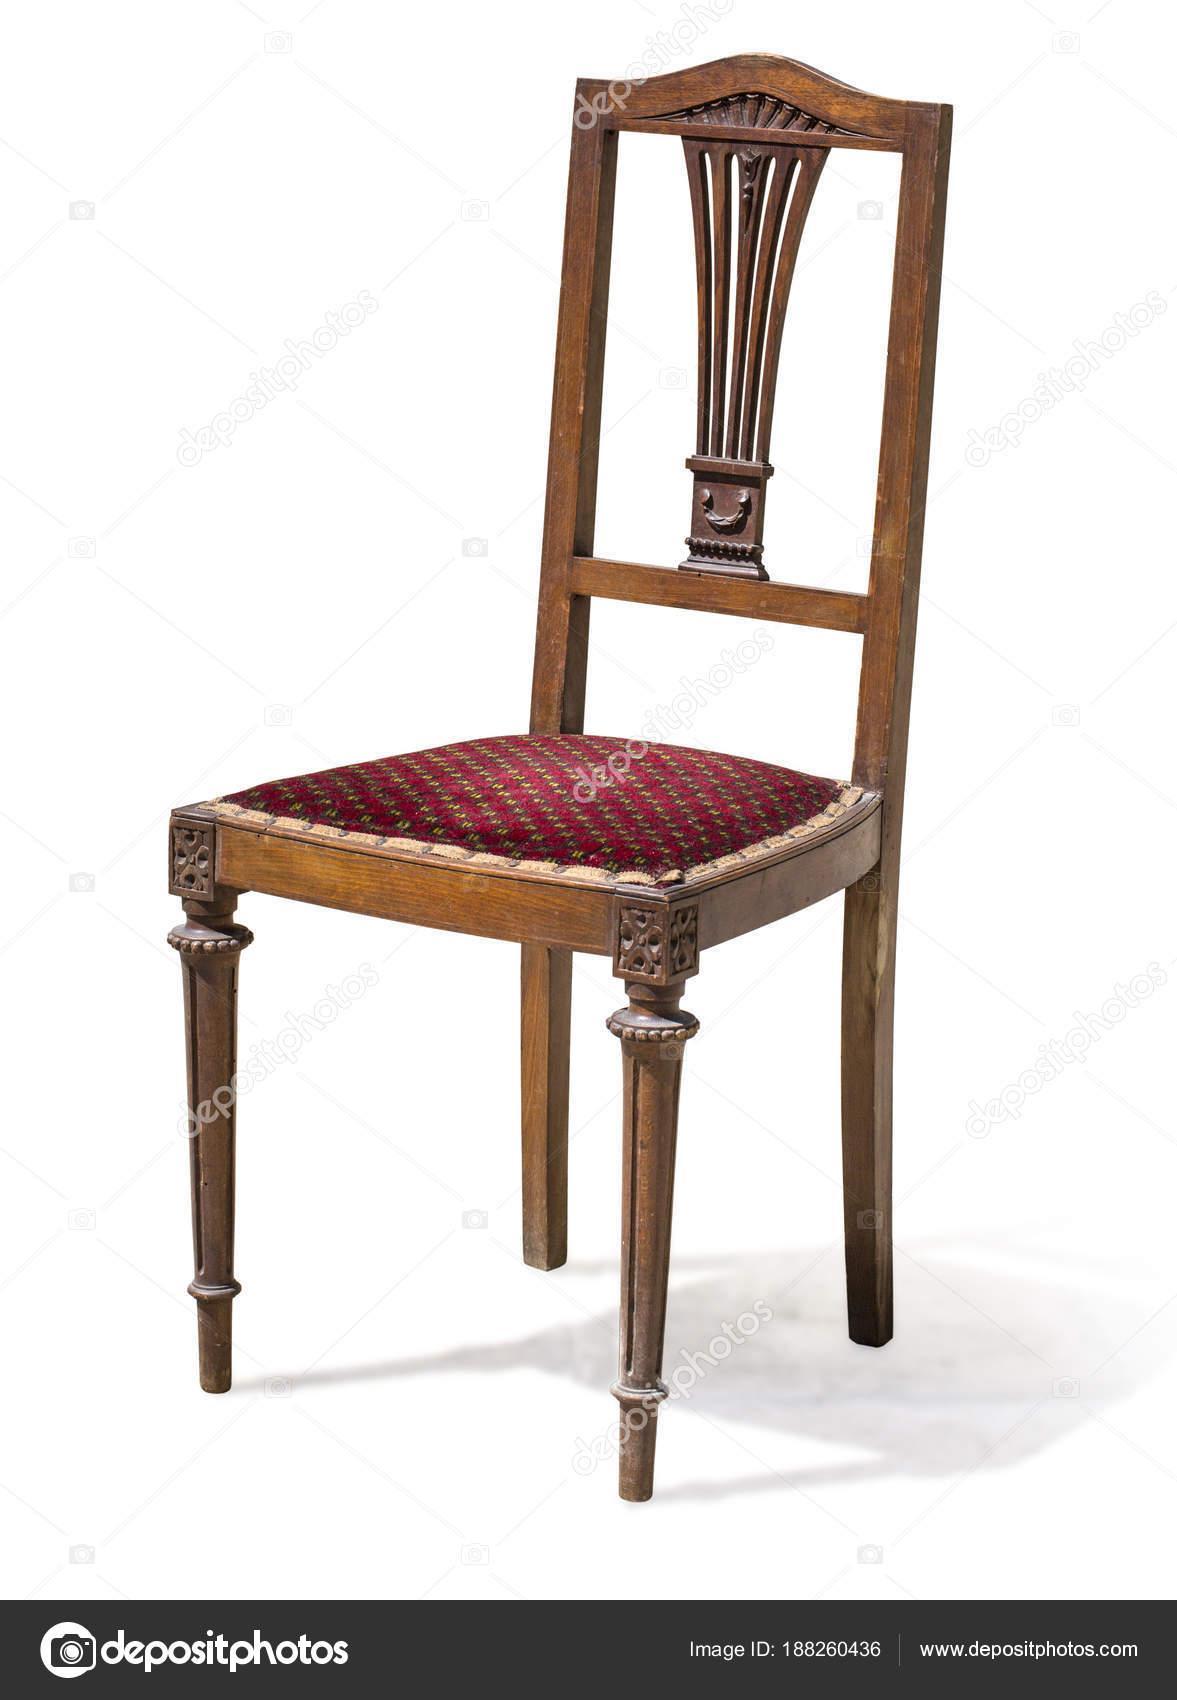 silla cocina madera vintage — Fotos de Stock © kornienkoalex #188260436